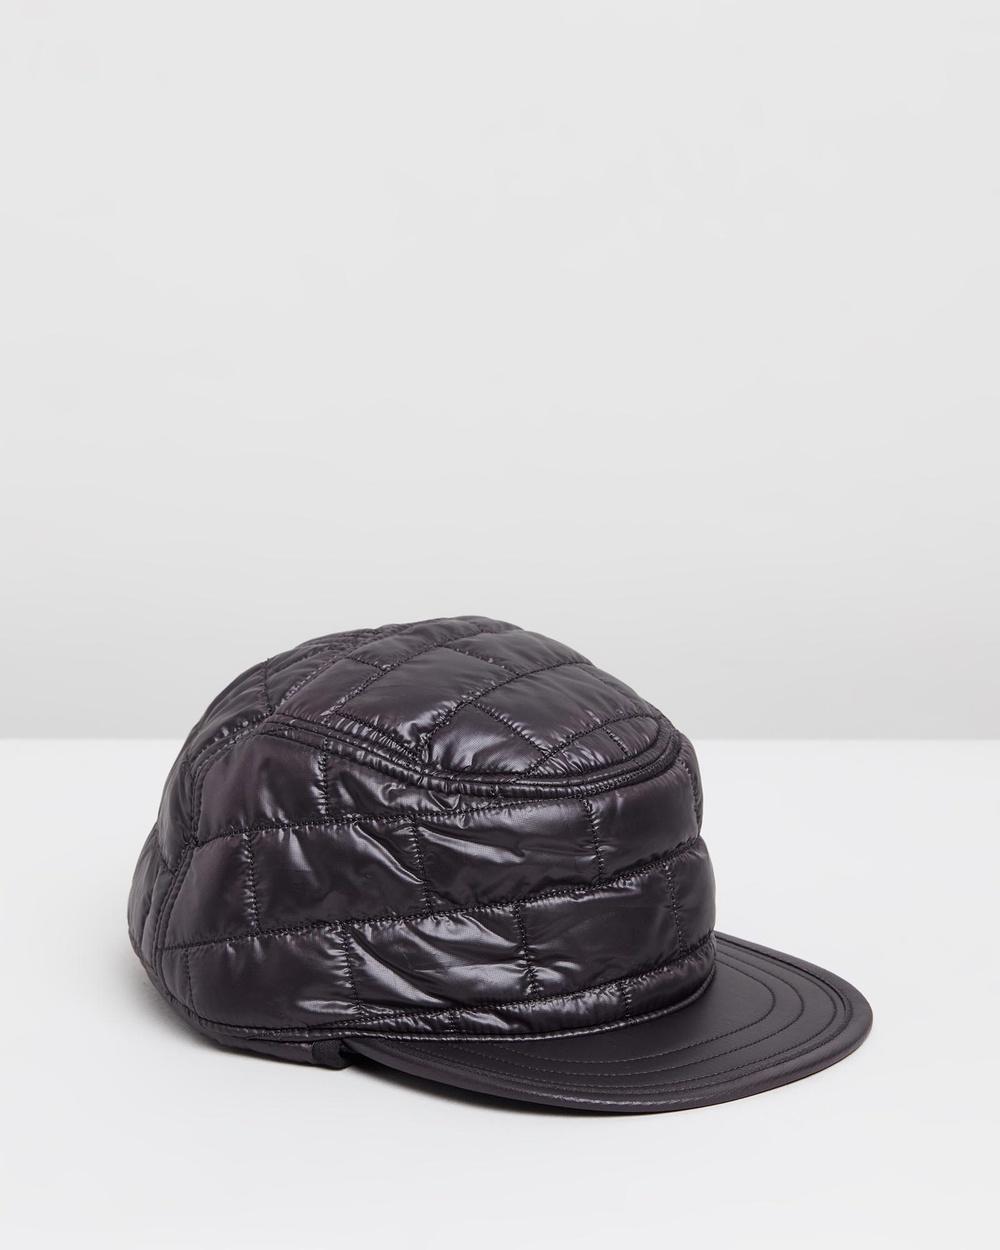 Patagonia Nano Puff Earflap Cap Headwear Black